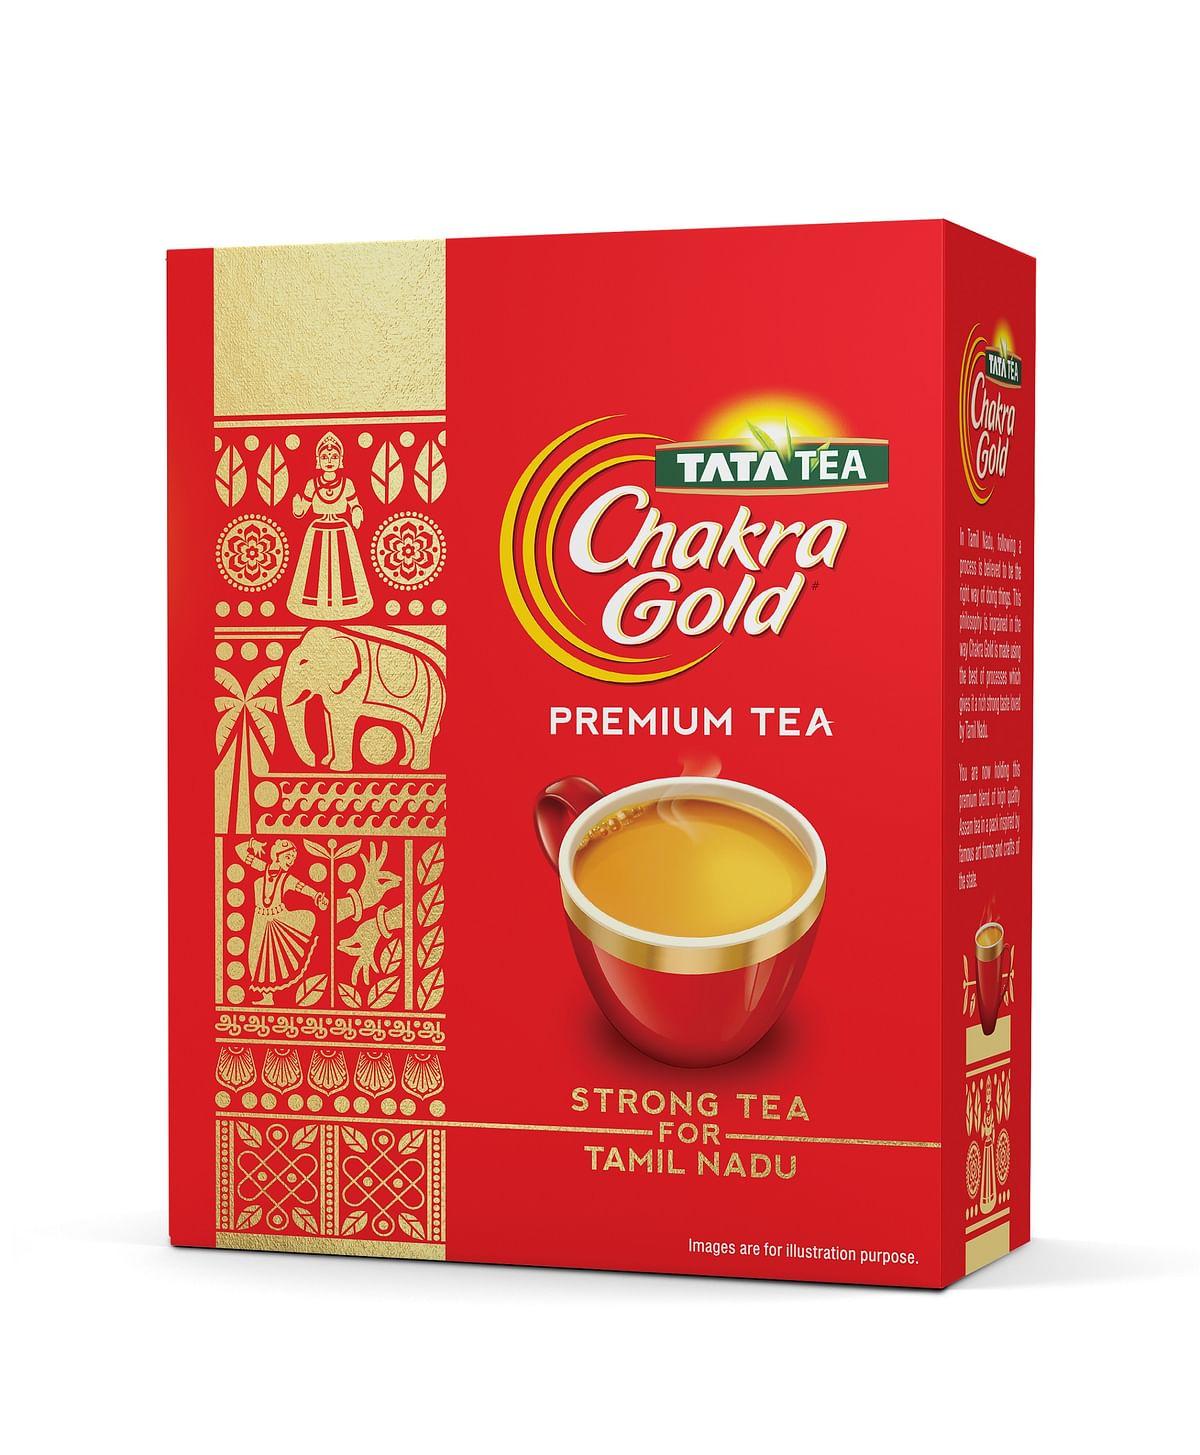 Tata Tea Chakra Gold celebrates Tamil Nadu with new packaging and sand art installation